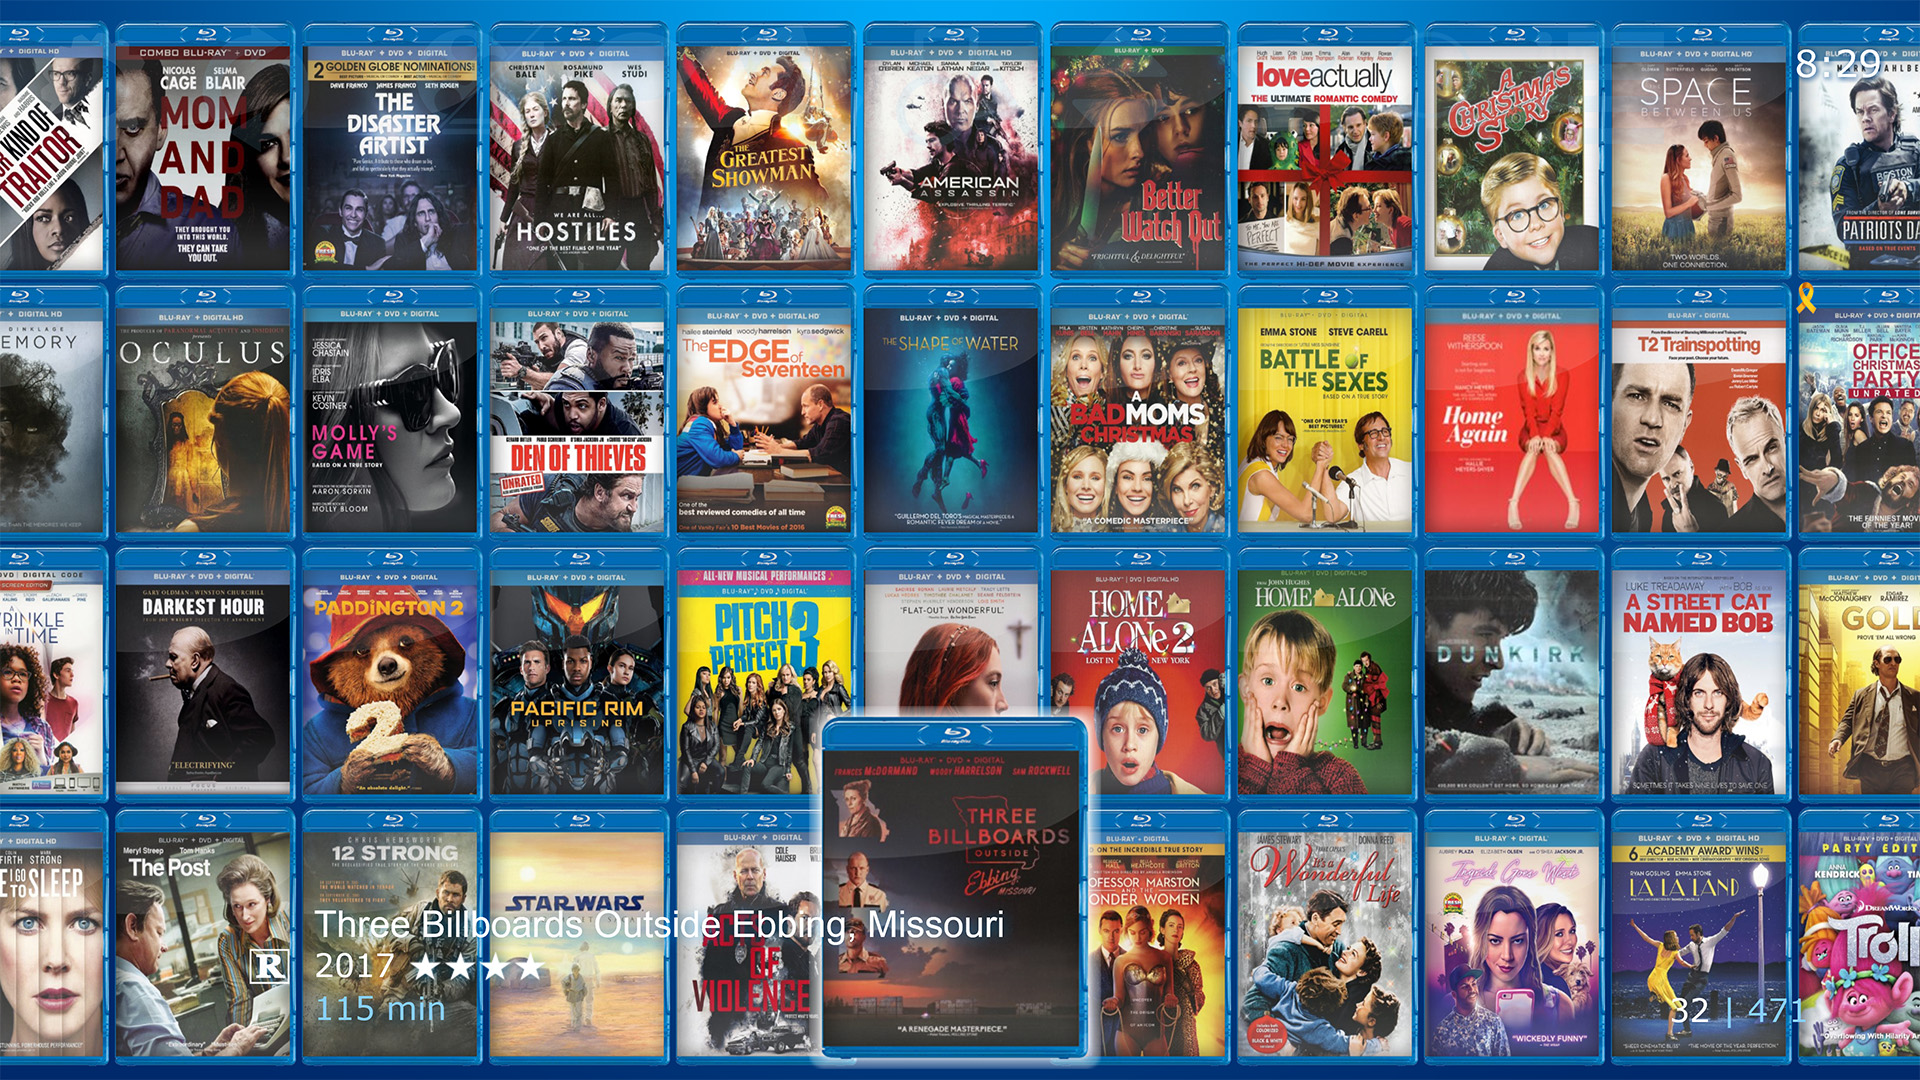 Chameleon MediaCenter Movie Library in 4-Cover Row mode